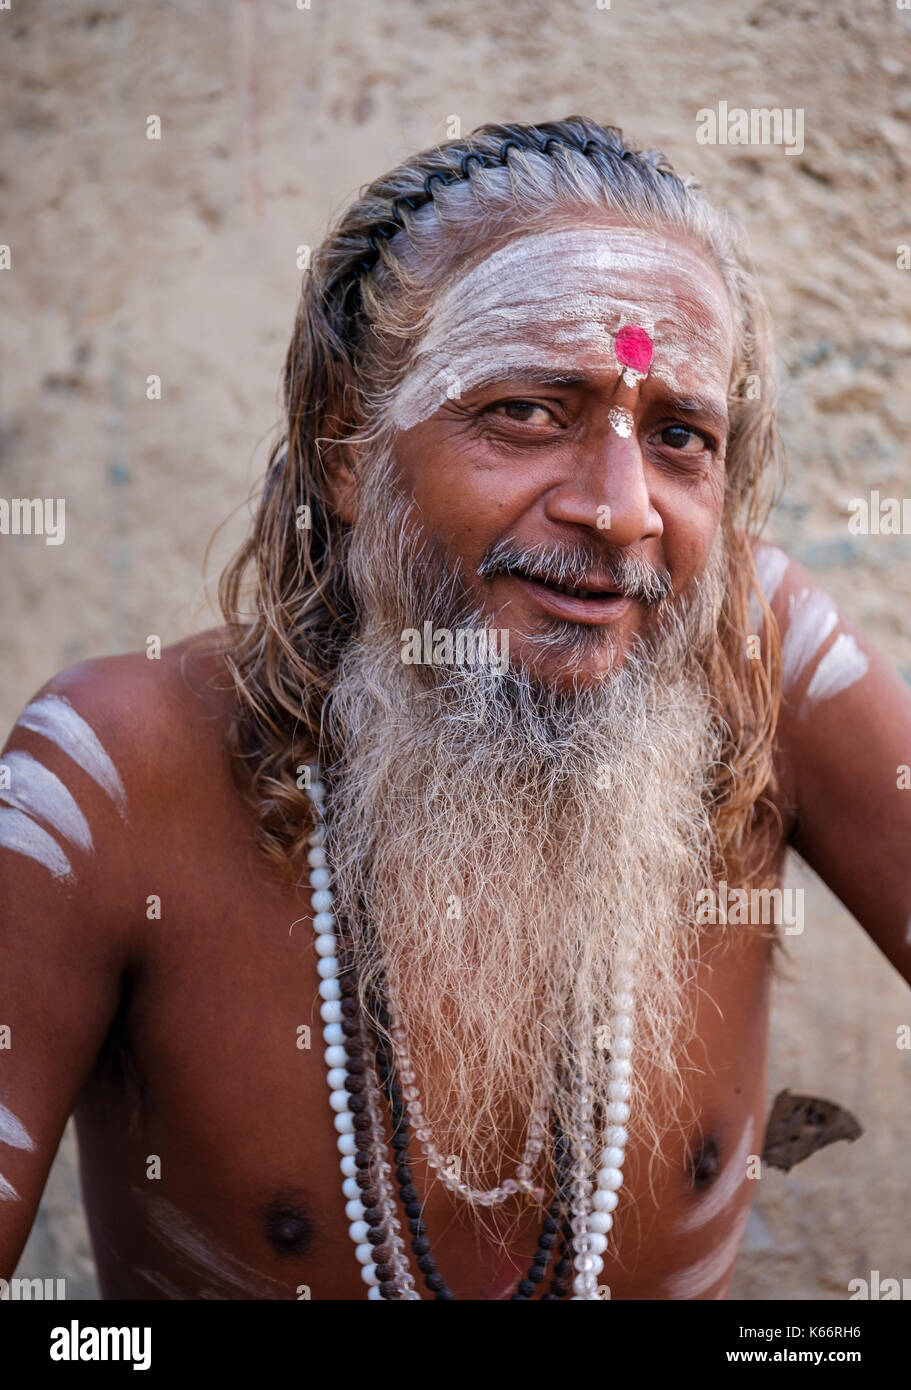 VARANASI, INDIA - CIRCA NOVEMBER 2016: Portrait of a Sadhu in Varanasi. The Sadhus or Holy Man are widely respected in India. Varanasi is the spiritua - Stock Image